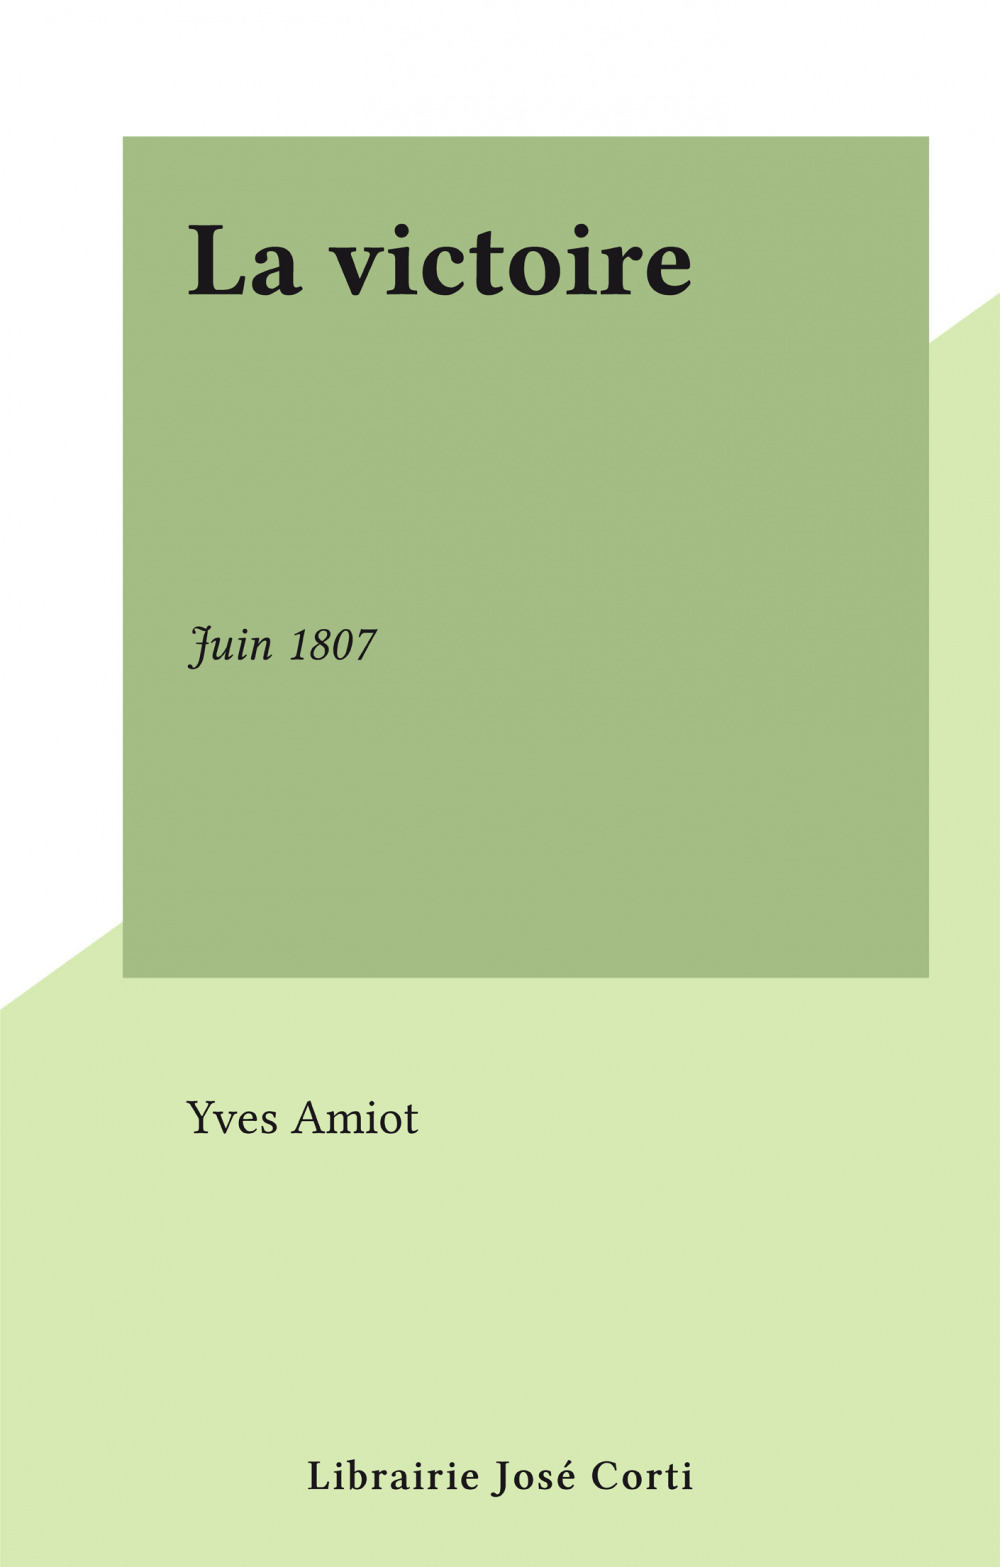 La victoire  - Yves Amiot